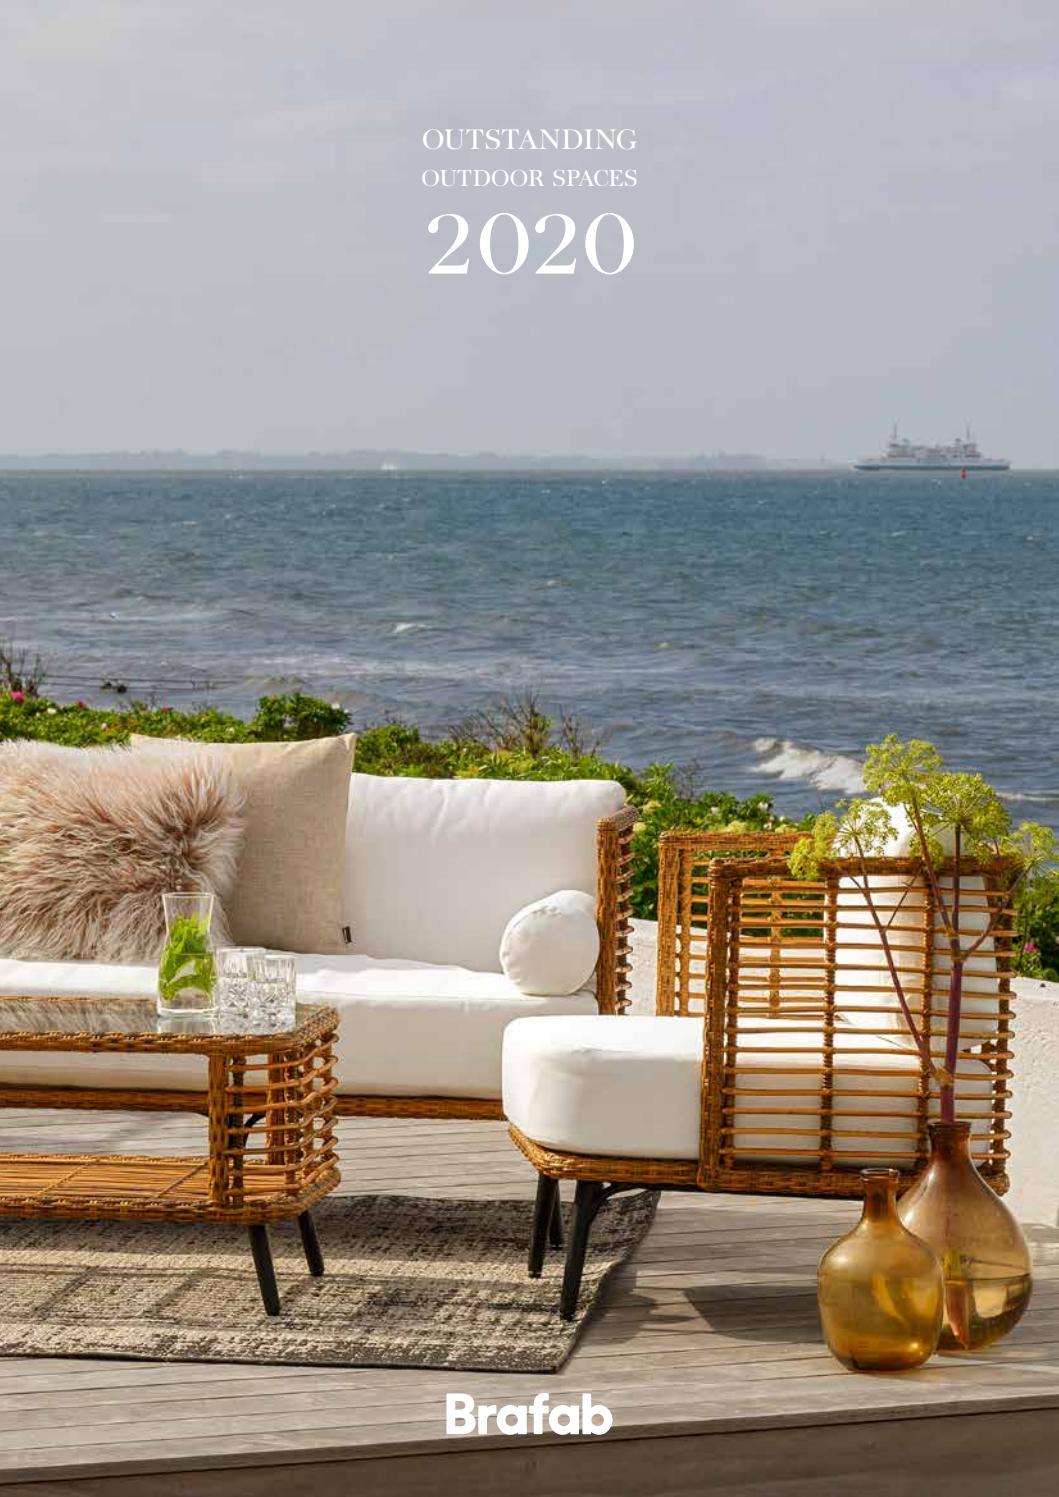 Brafab catalogue 2020 (English) by Brafab issuu